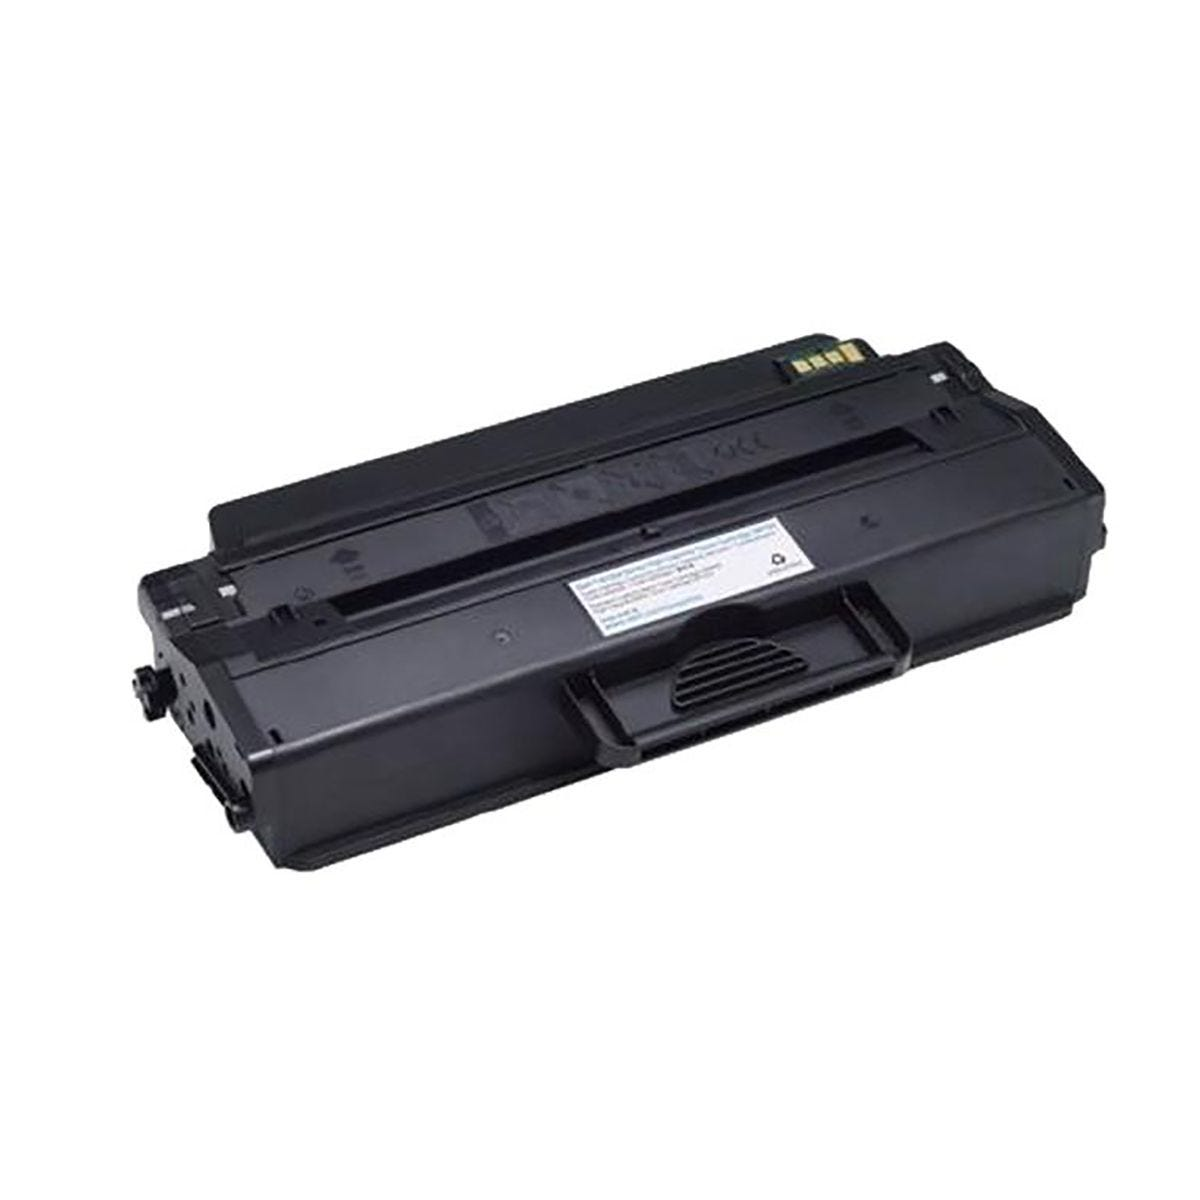 Image of Dell 1260DN Black Toner